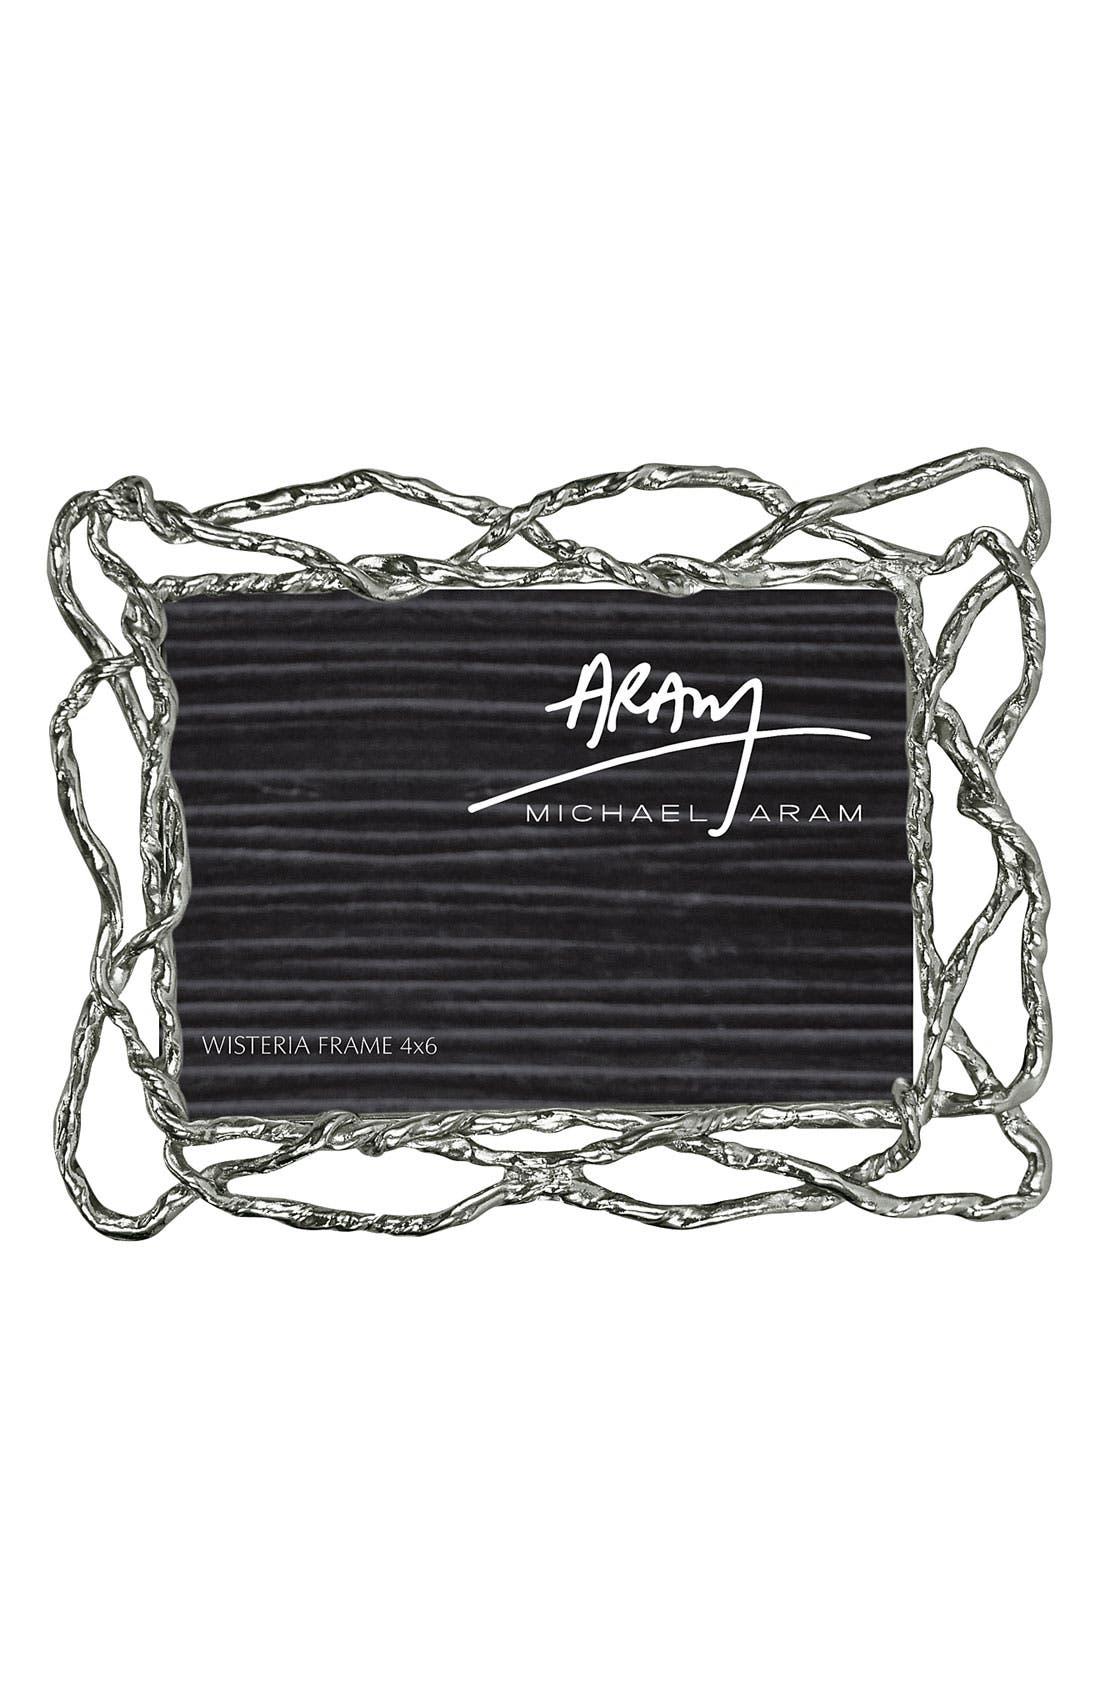 Alternate Image 2  - Michael Aram 'Wisteria' Picture Frame (4x6)